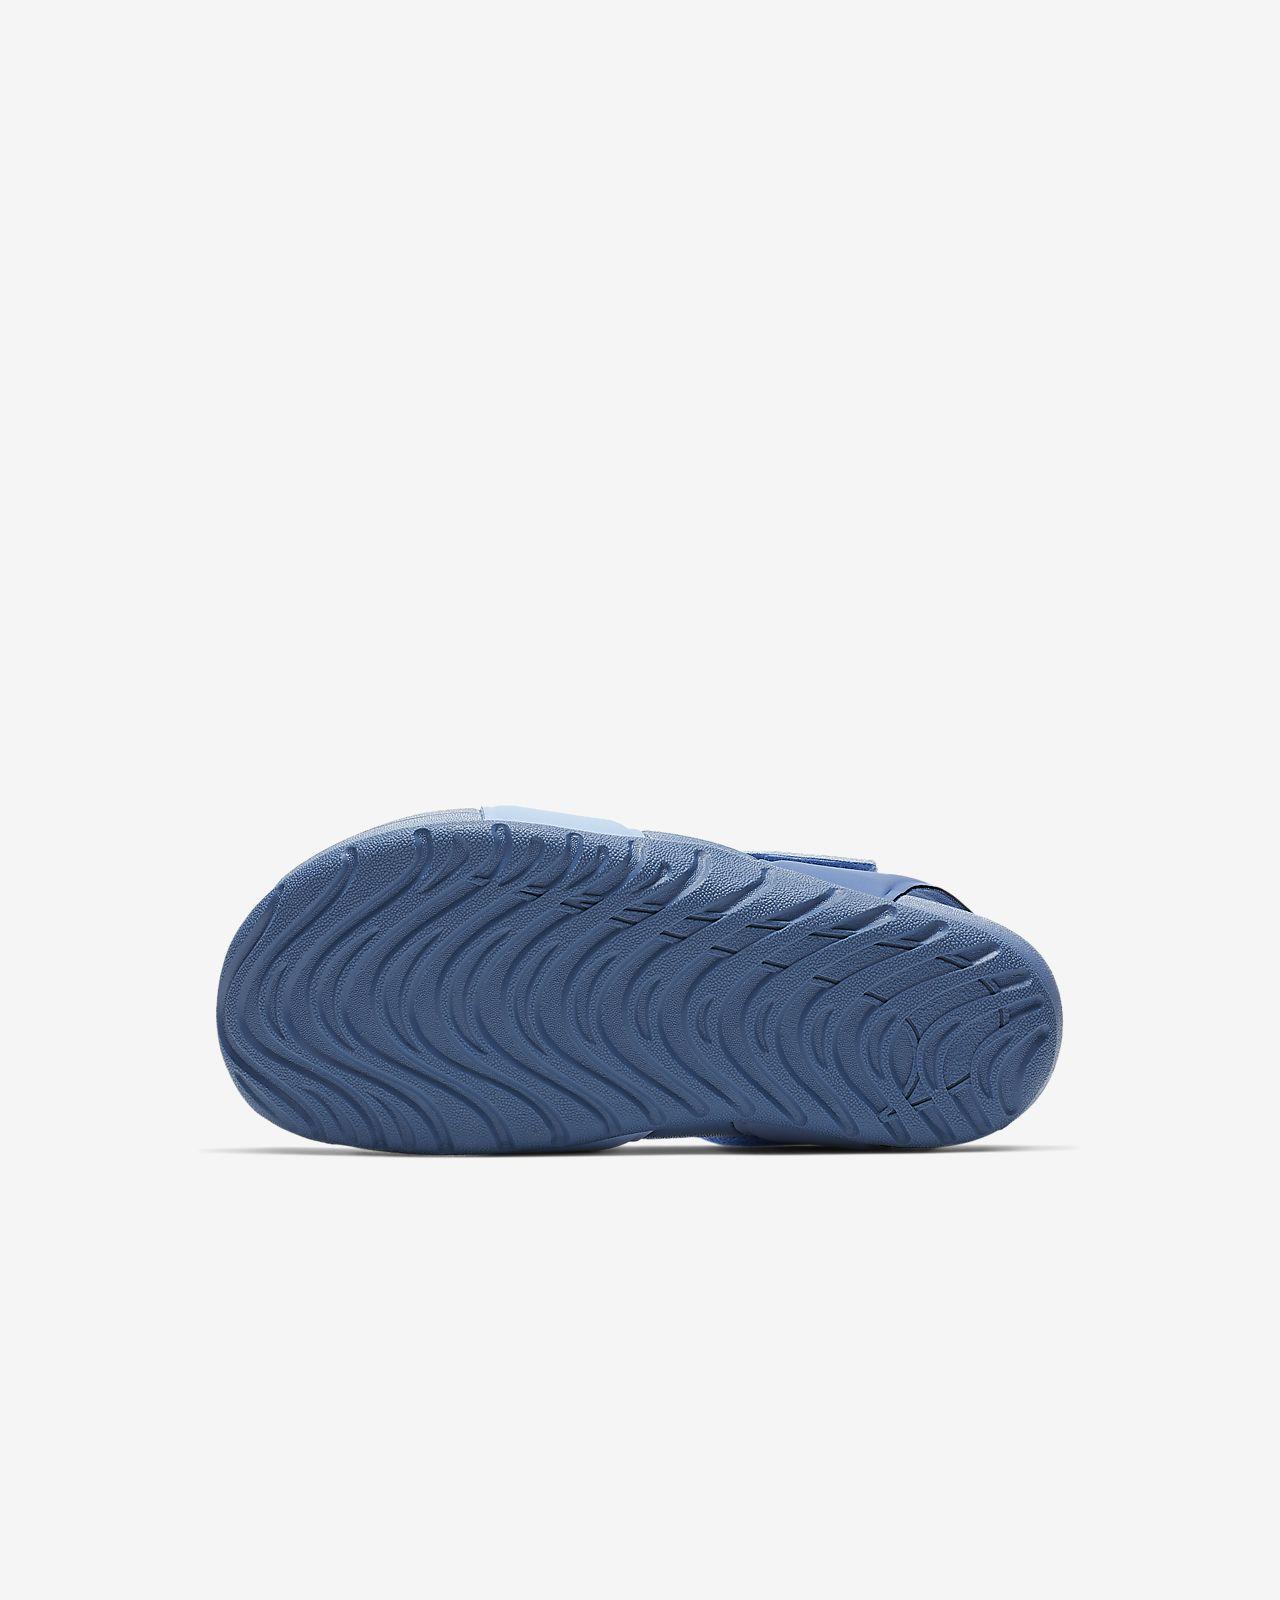 7097ec056656 Nike Sunray Protect 2 Younger Kids  Sandal. Nike.com CA